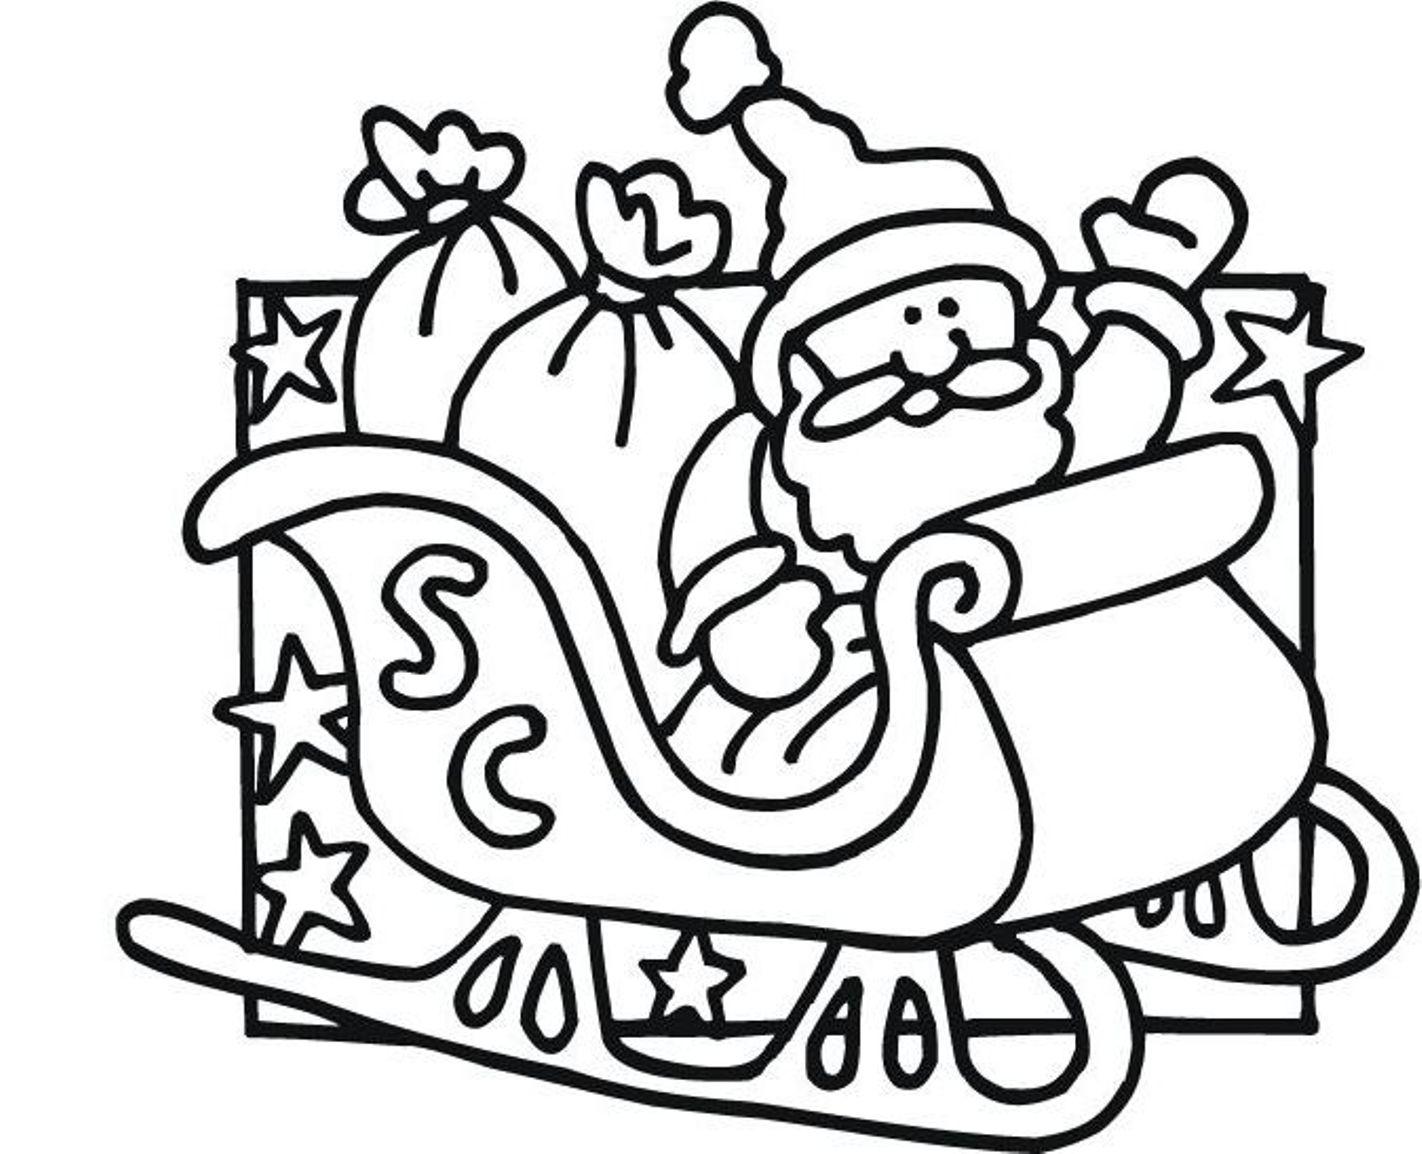 Christmas Drawing Designs At GetDrawings